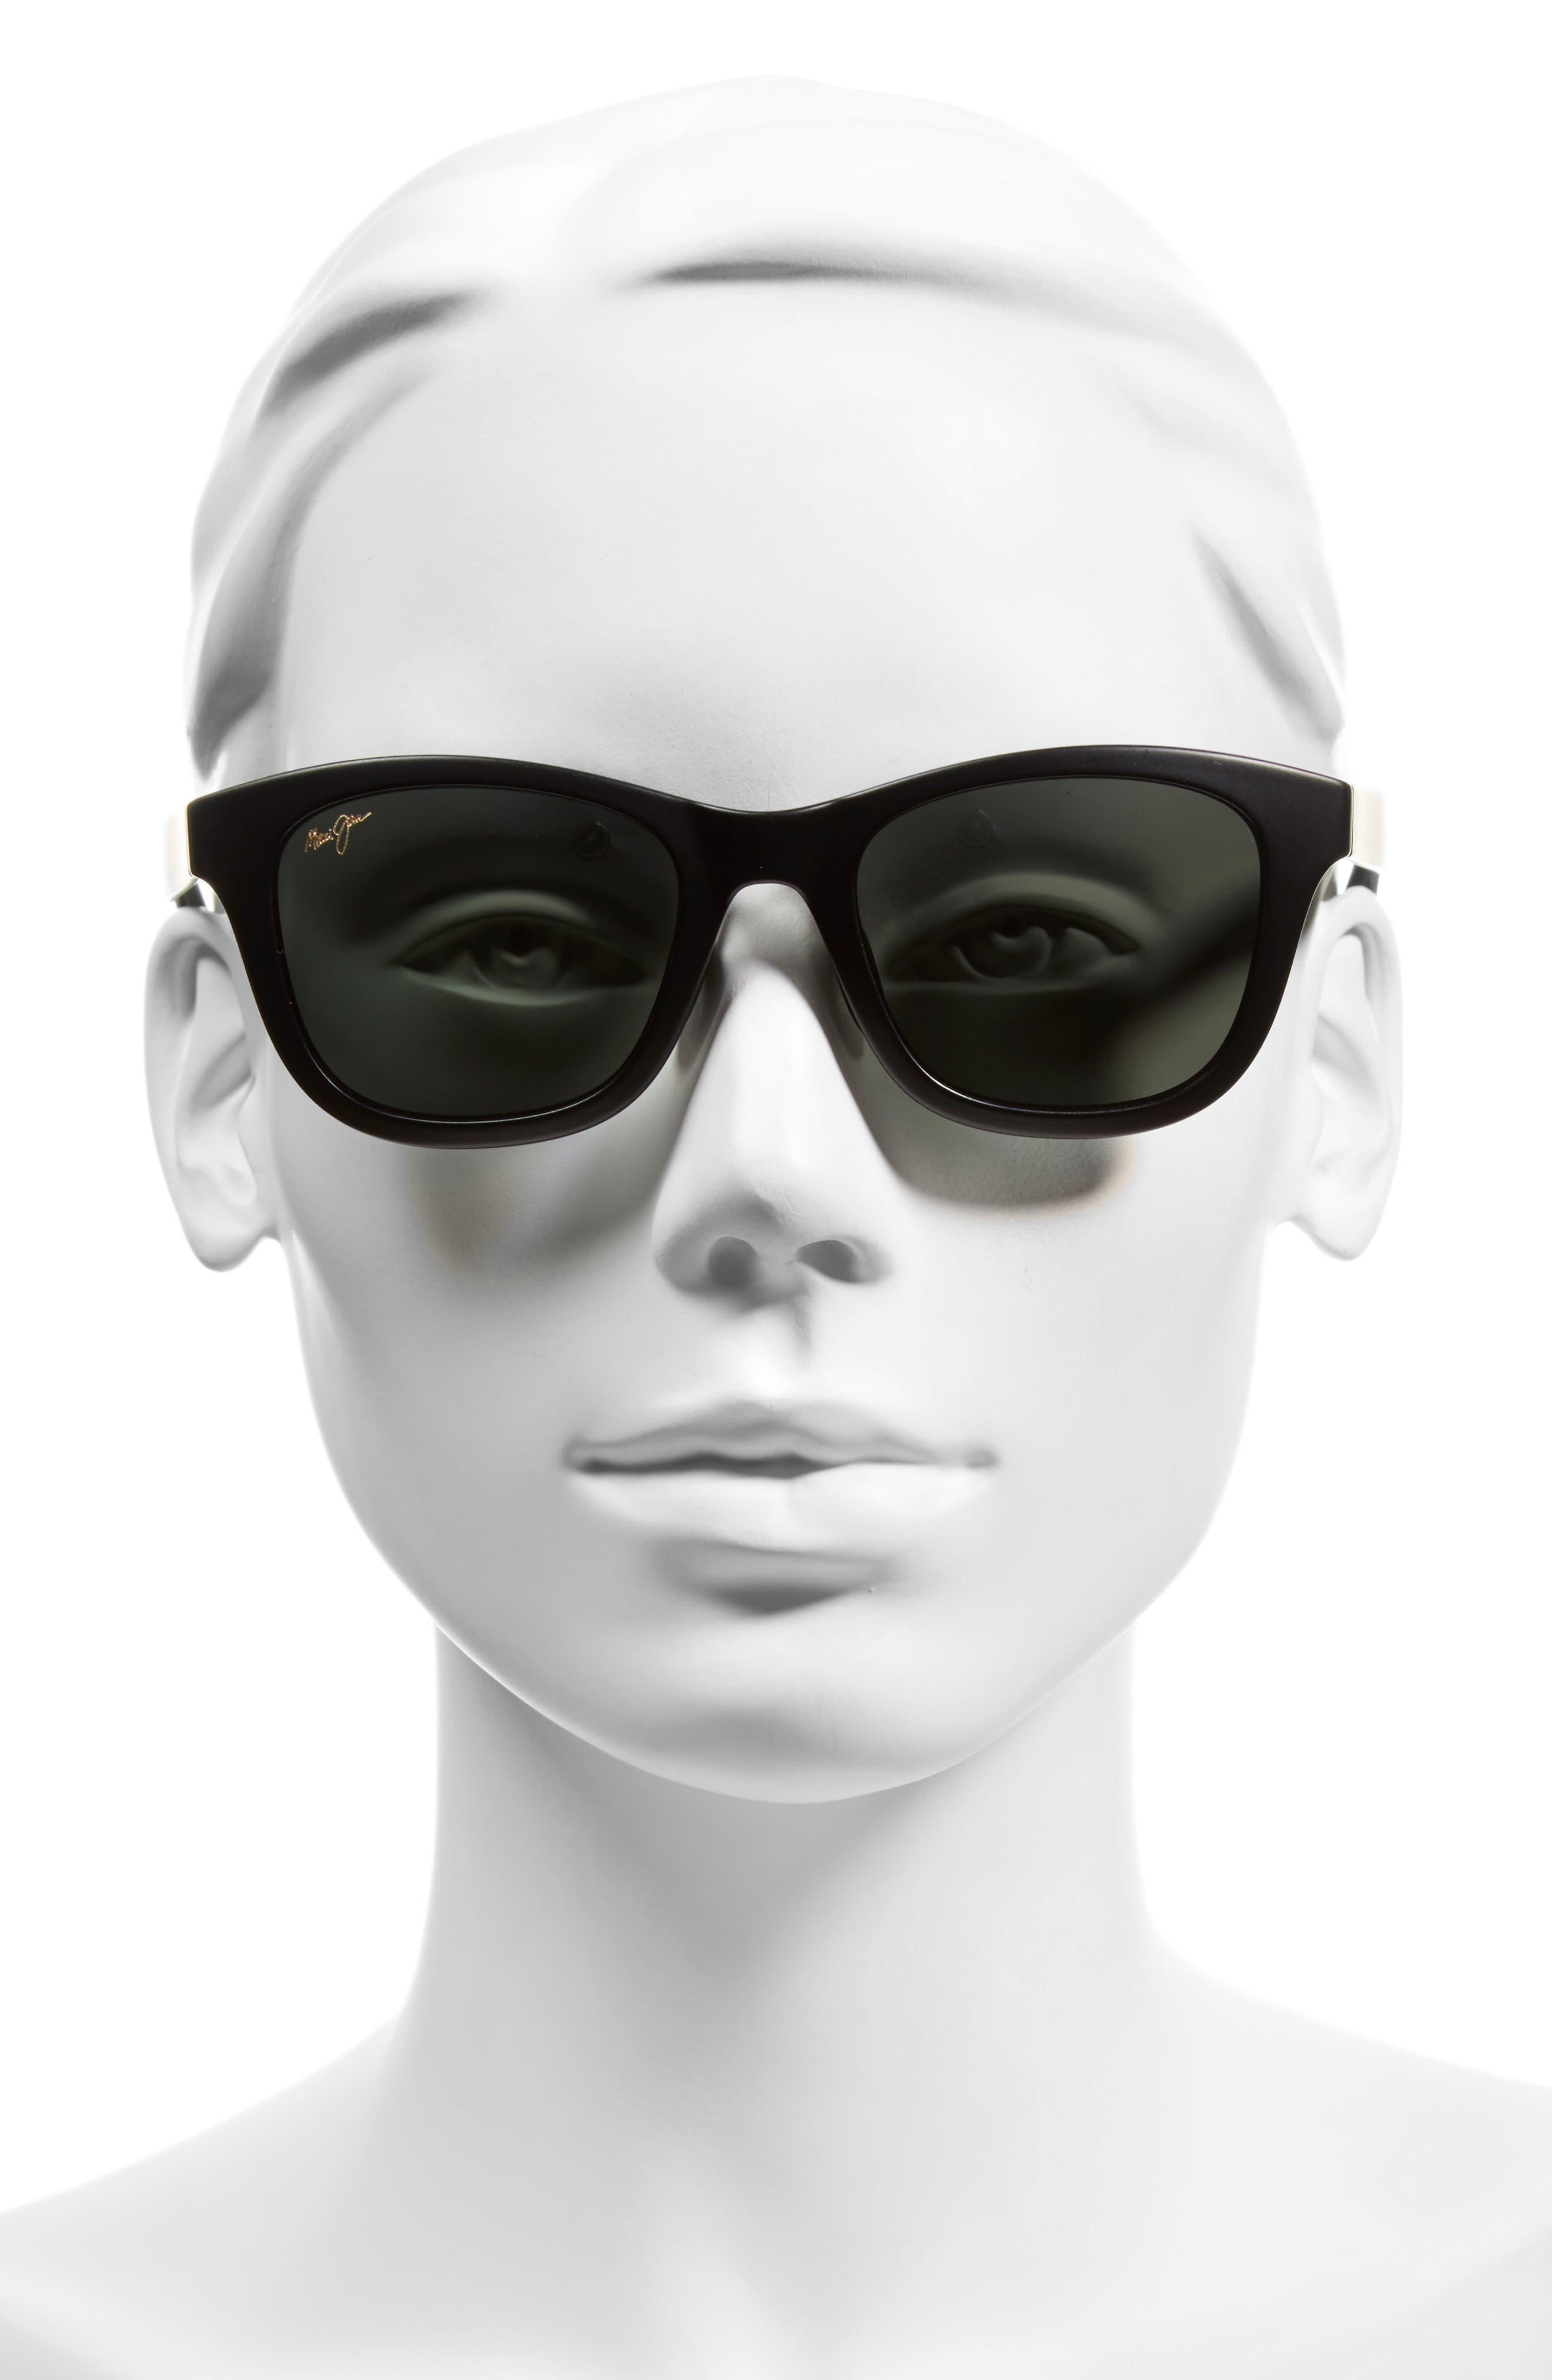 Hana Bay 51mm PolarizedPlus2<sup>®</sup> Sunglasses,                             Alternate thumbnail 2, color,                             MATTE BLACK/ NEUTRAL GREY